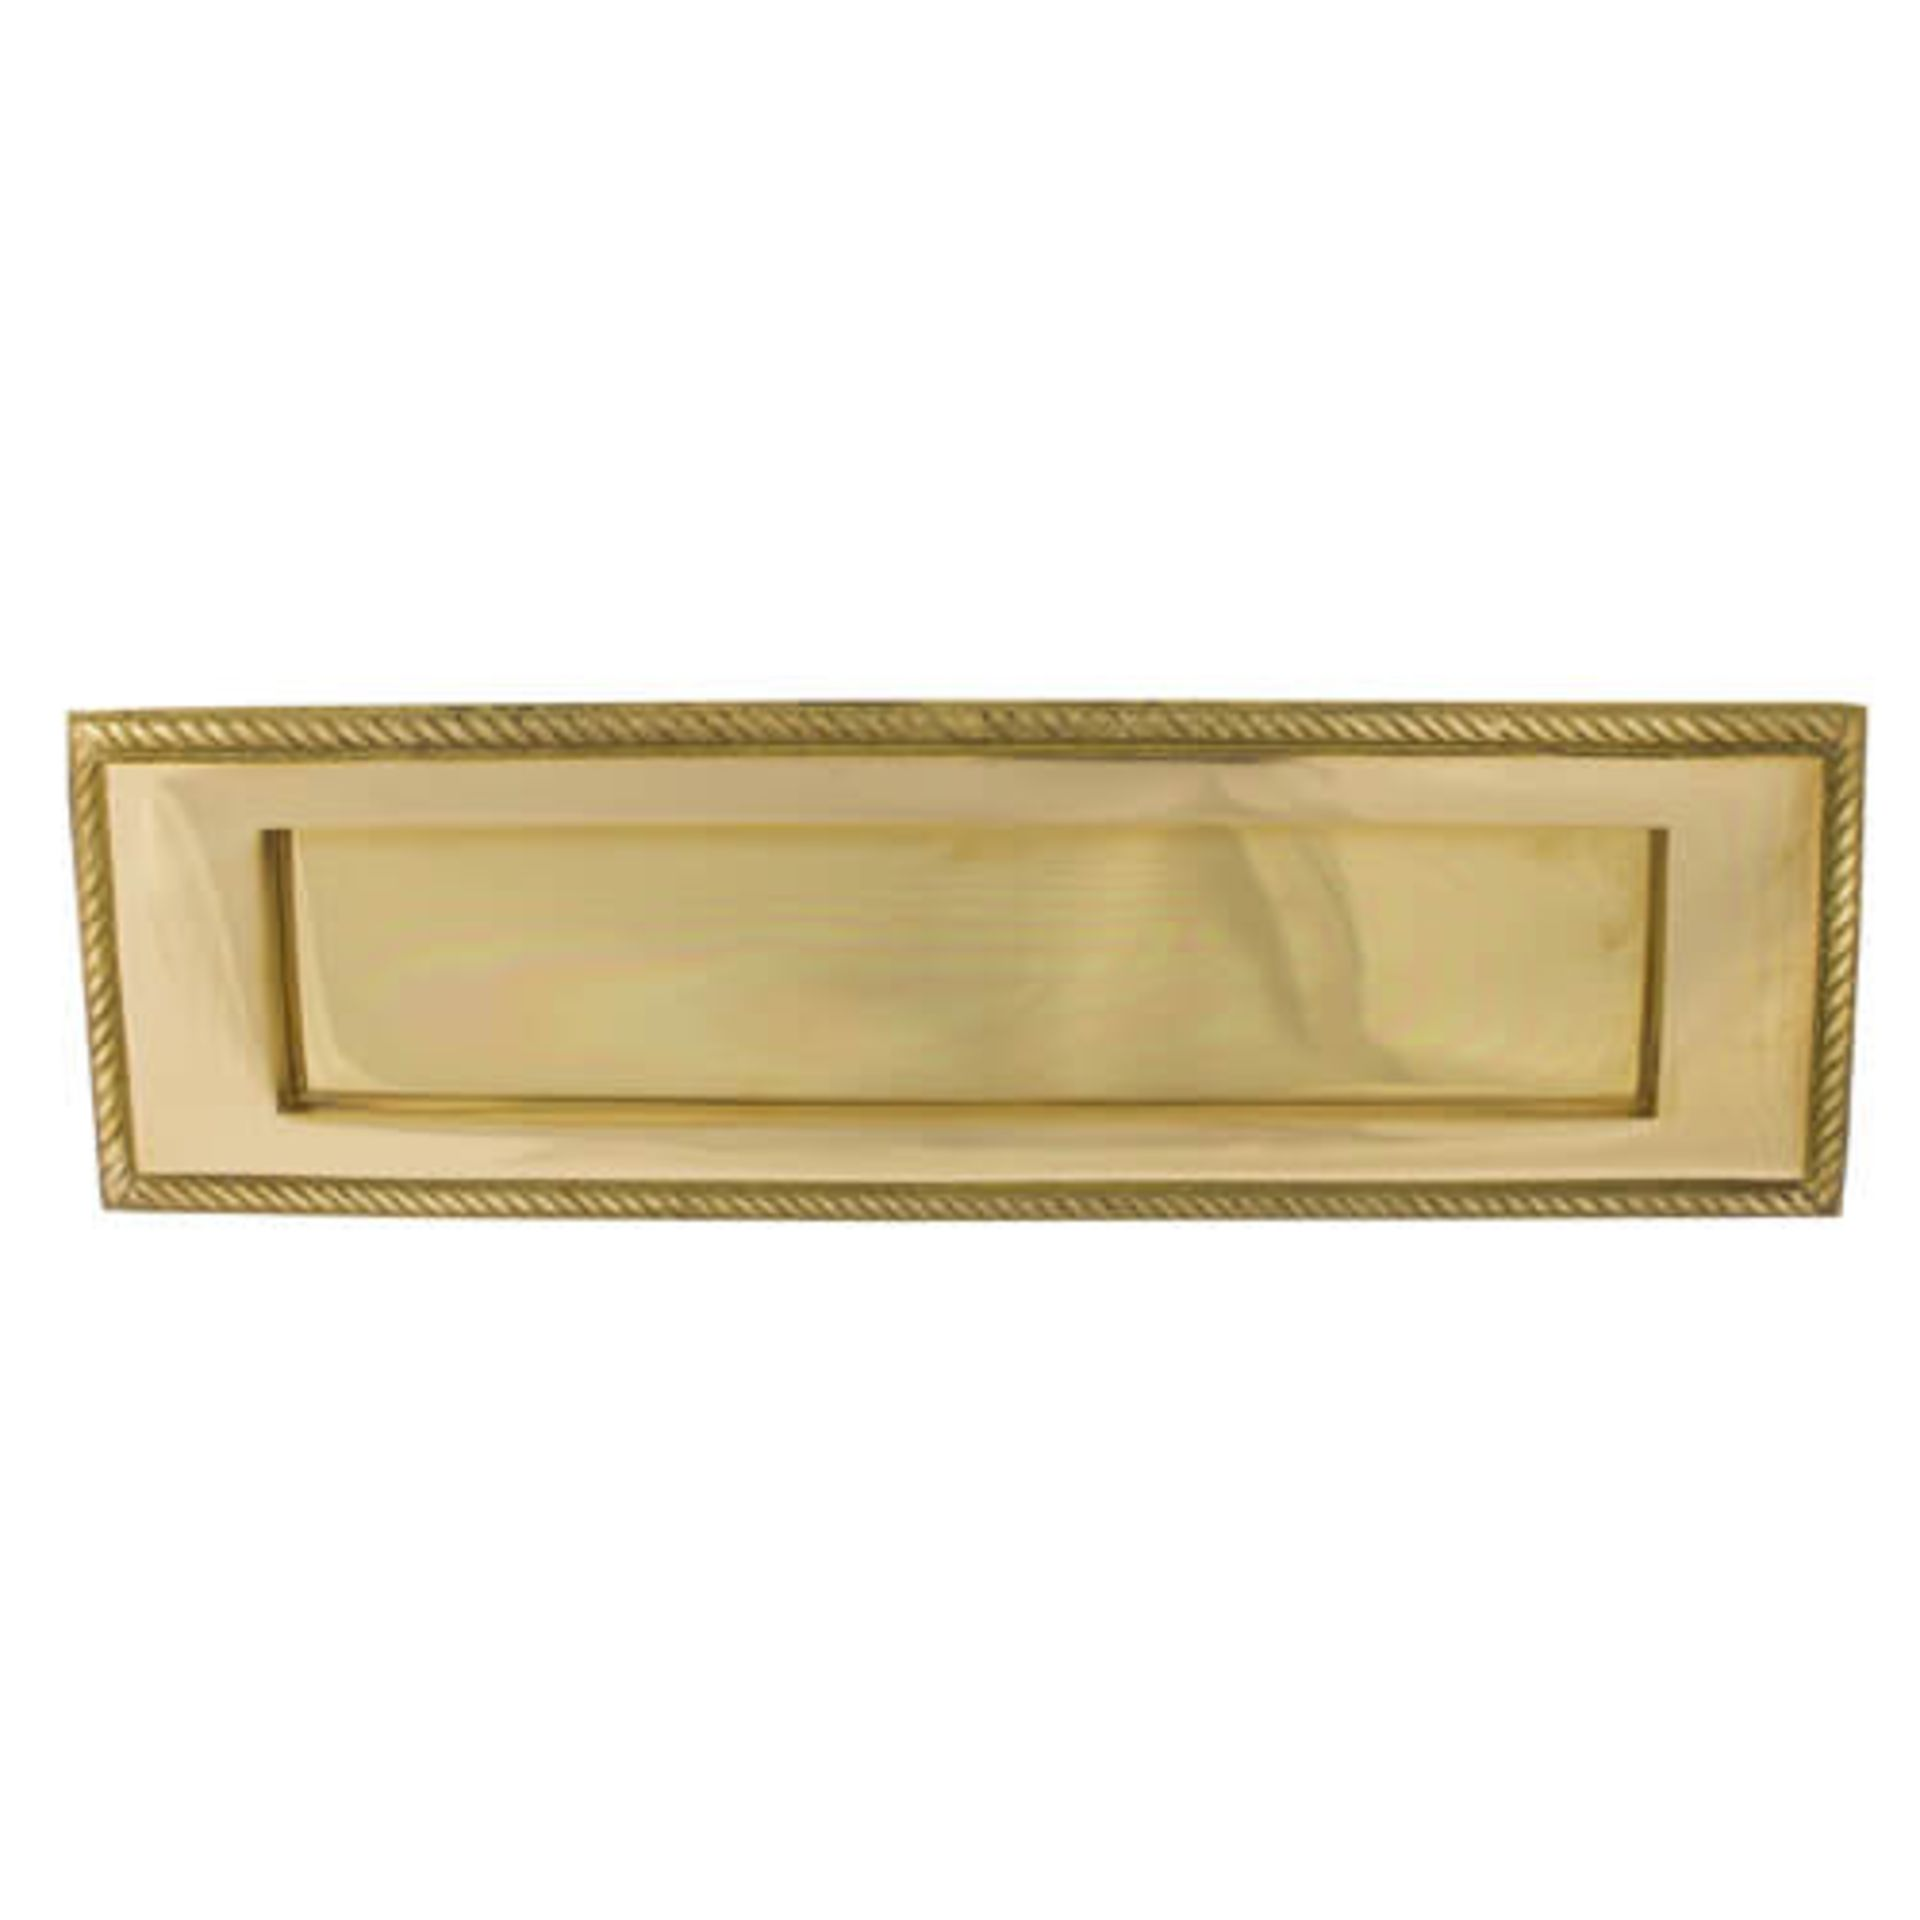 Lot 25 - 3 Georgian Letterplate Brass. 279mmx 84 Mm